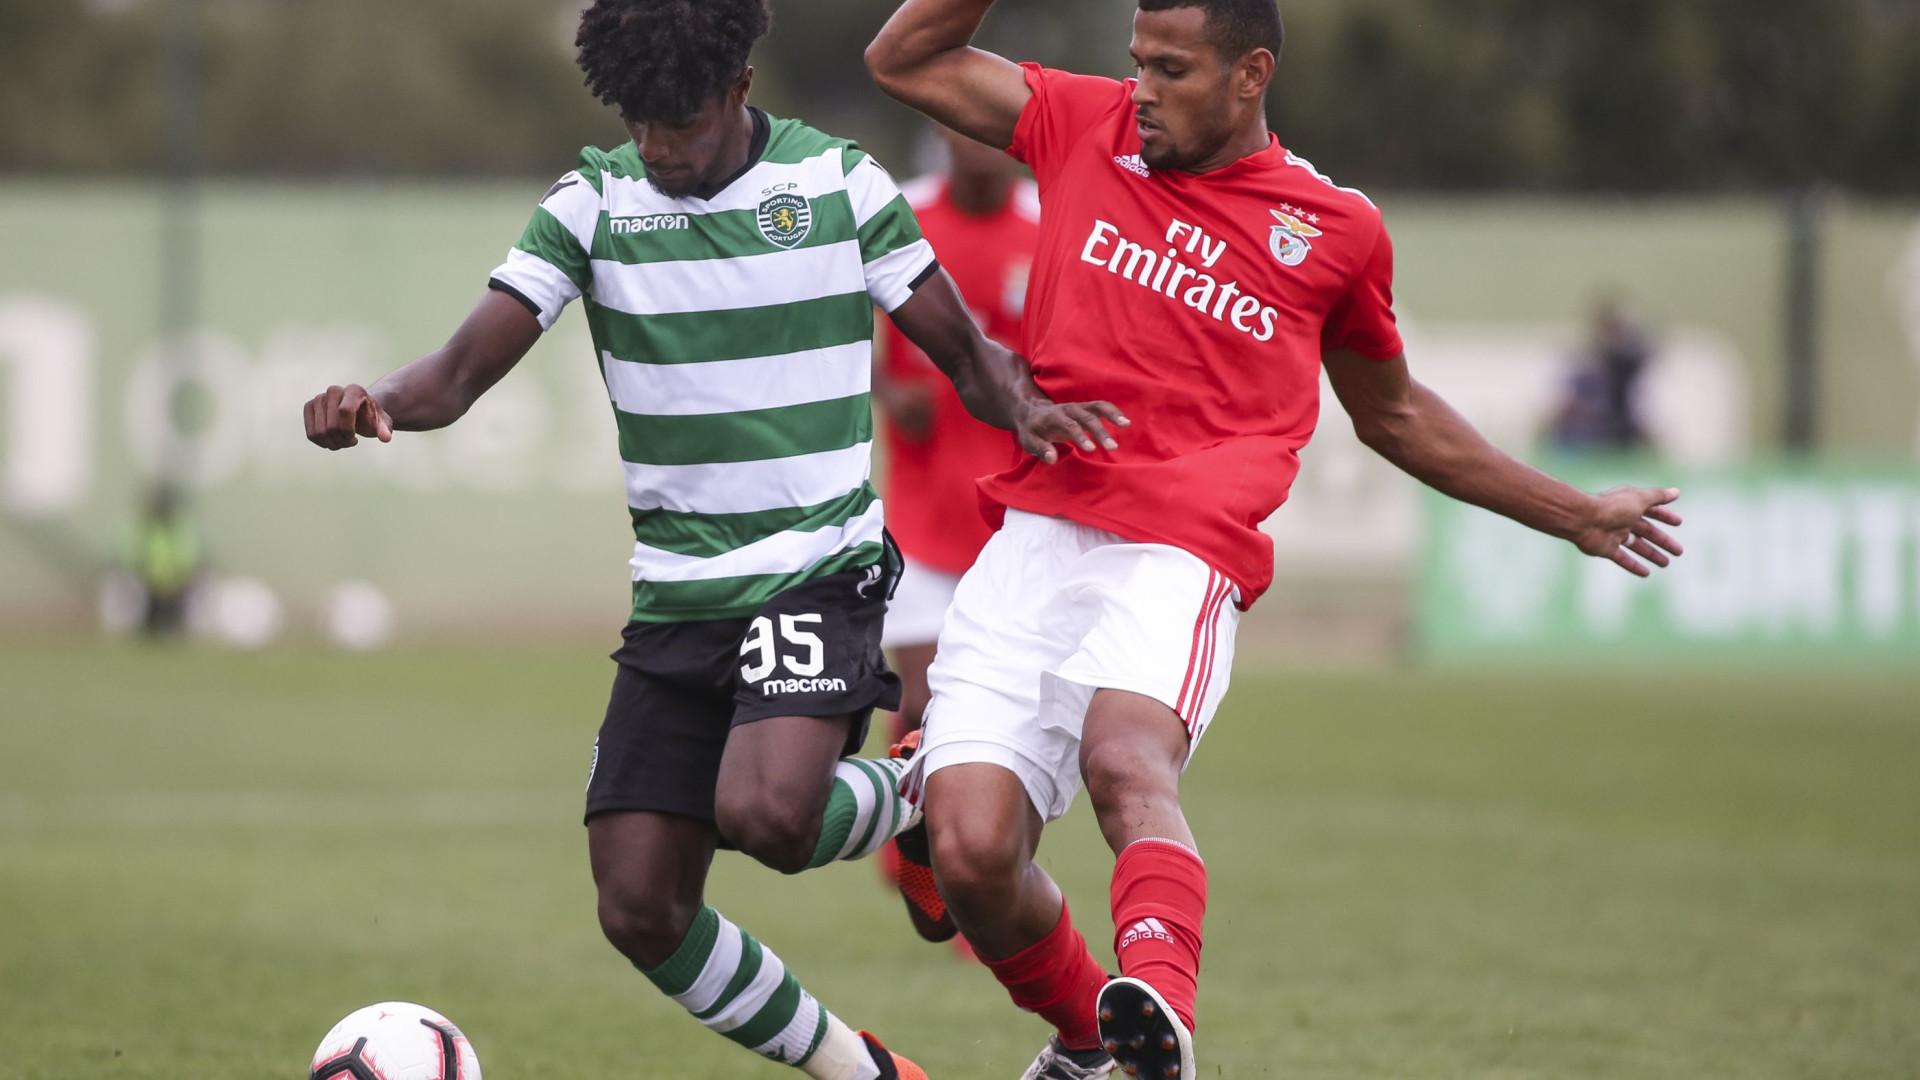 Sporting consegue arrancar empate frente ao Benfica no último suspiro